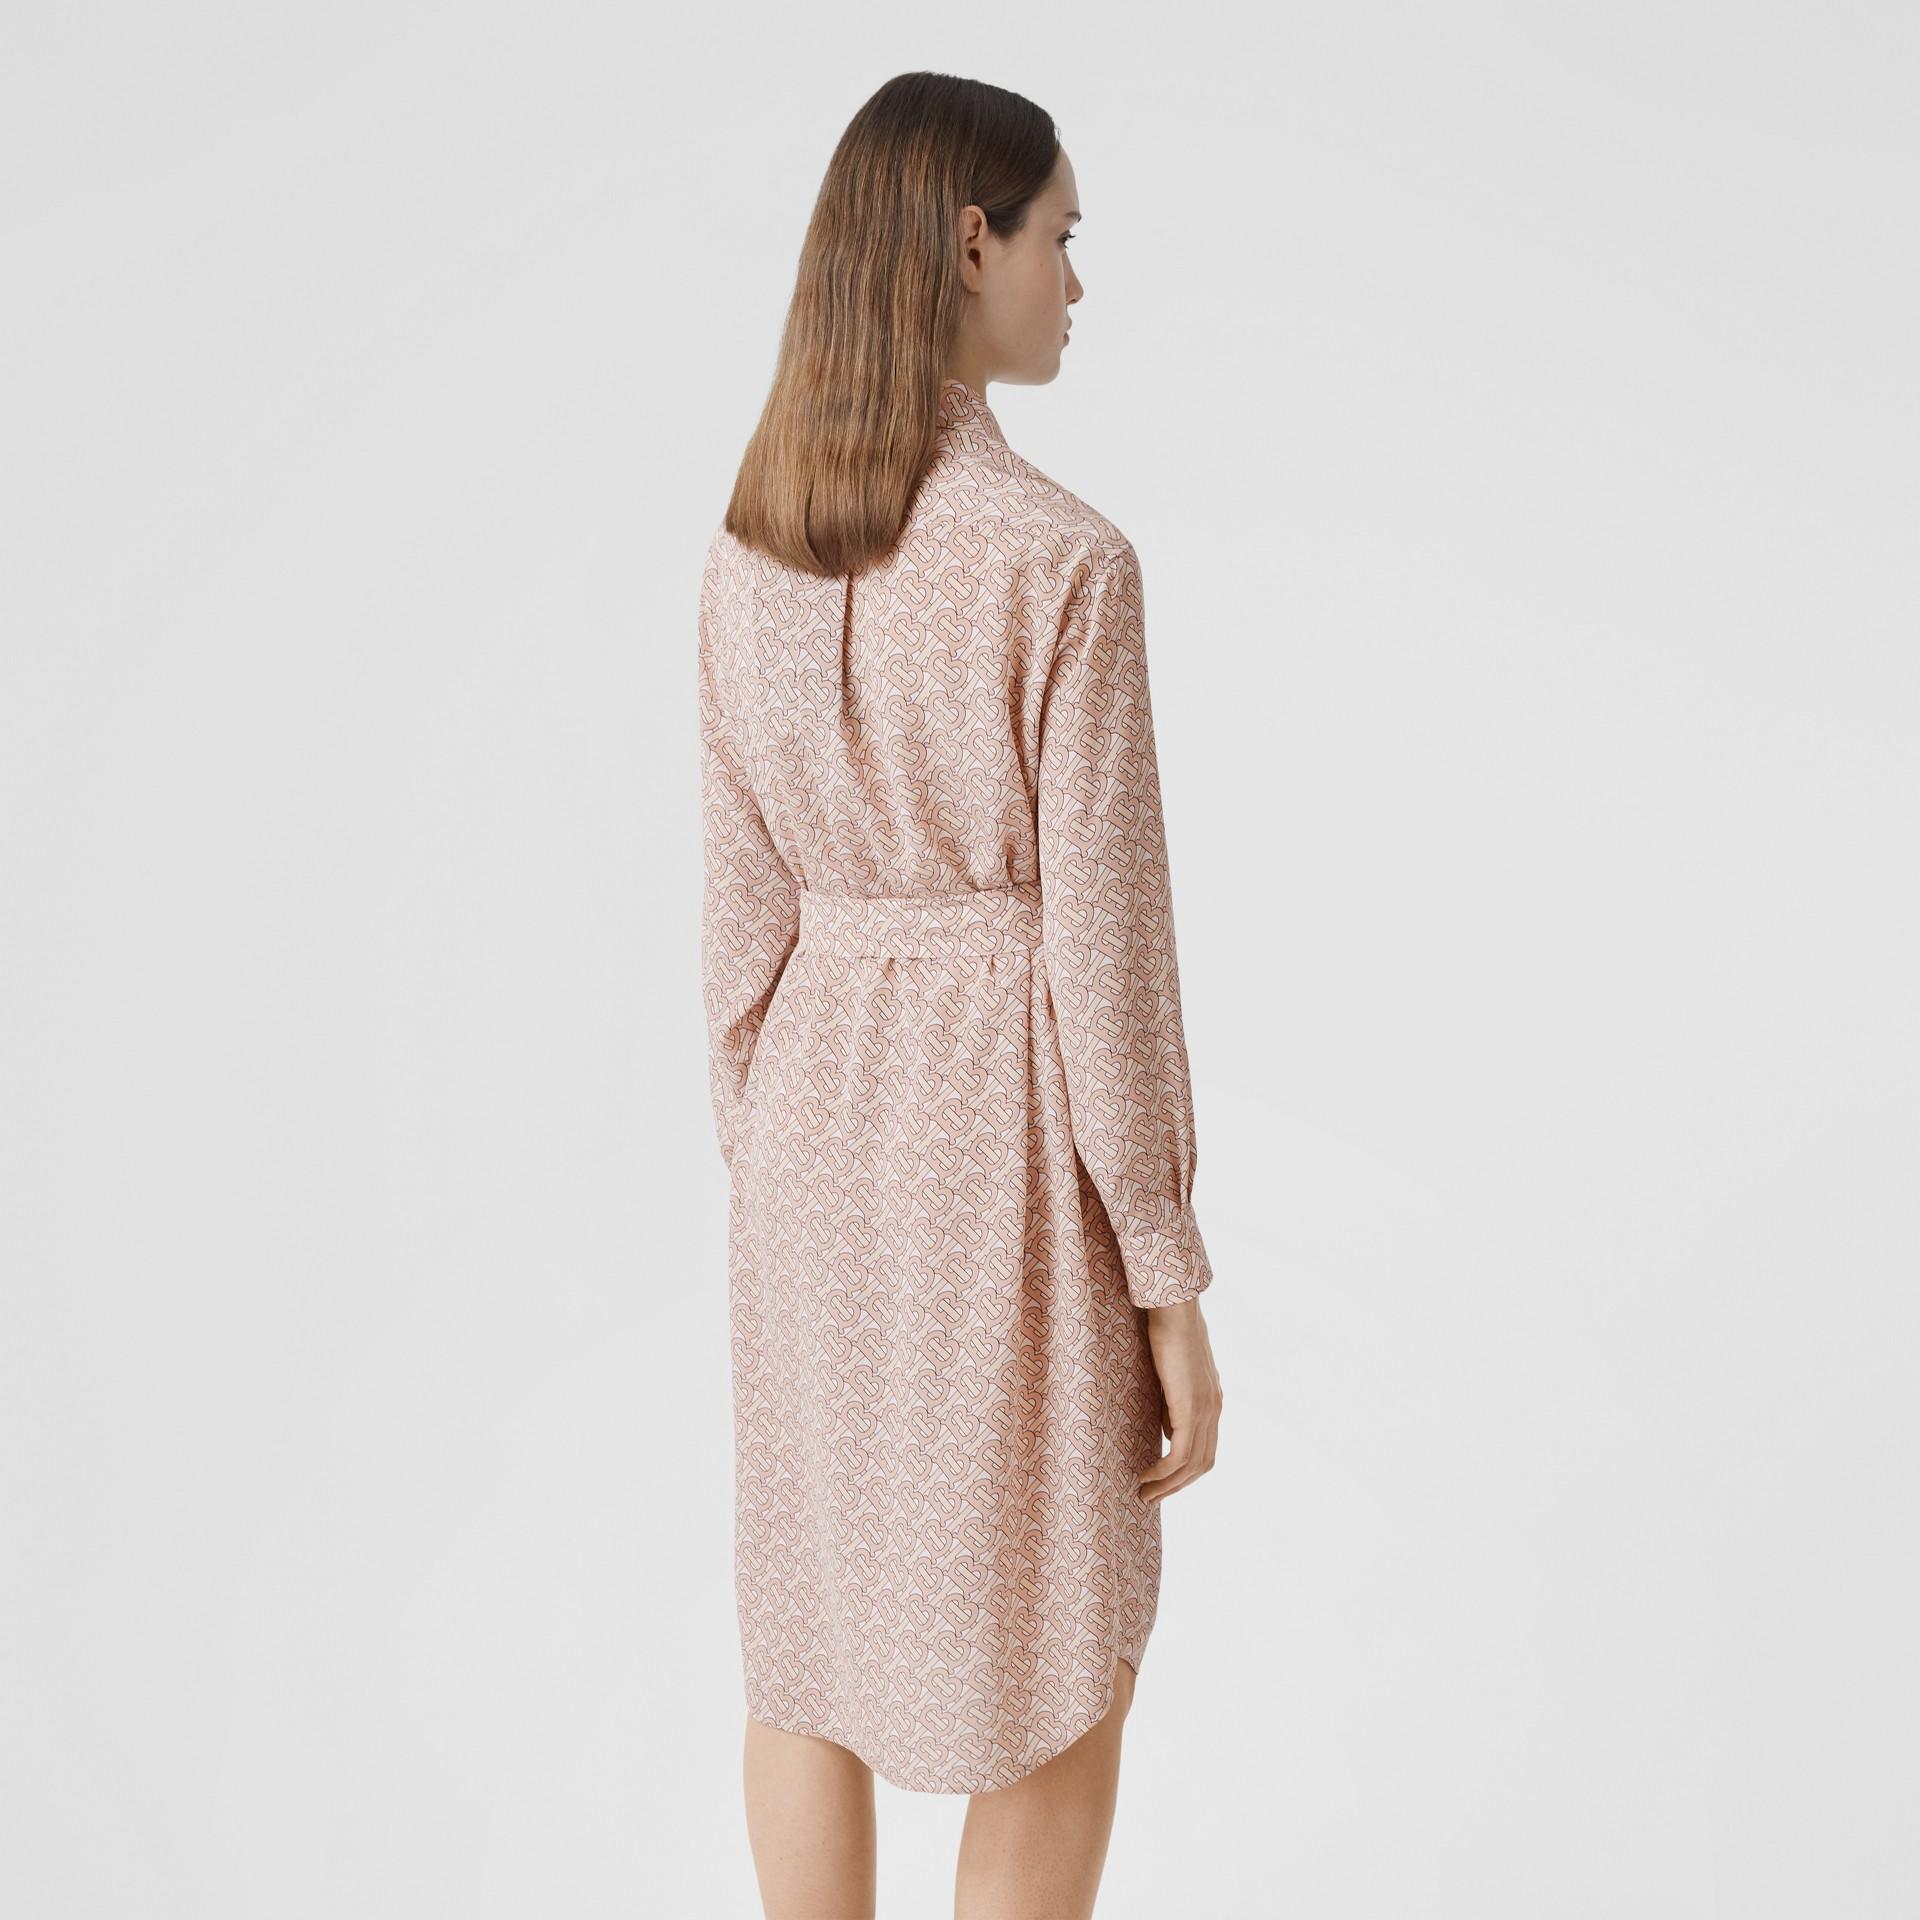 Monogram Print Silk Crepe De Chine Shirt Dress in Pale Copper Pink - Women | Burberry Hong Kong S.A.R - gallery image 2